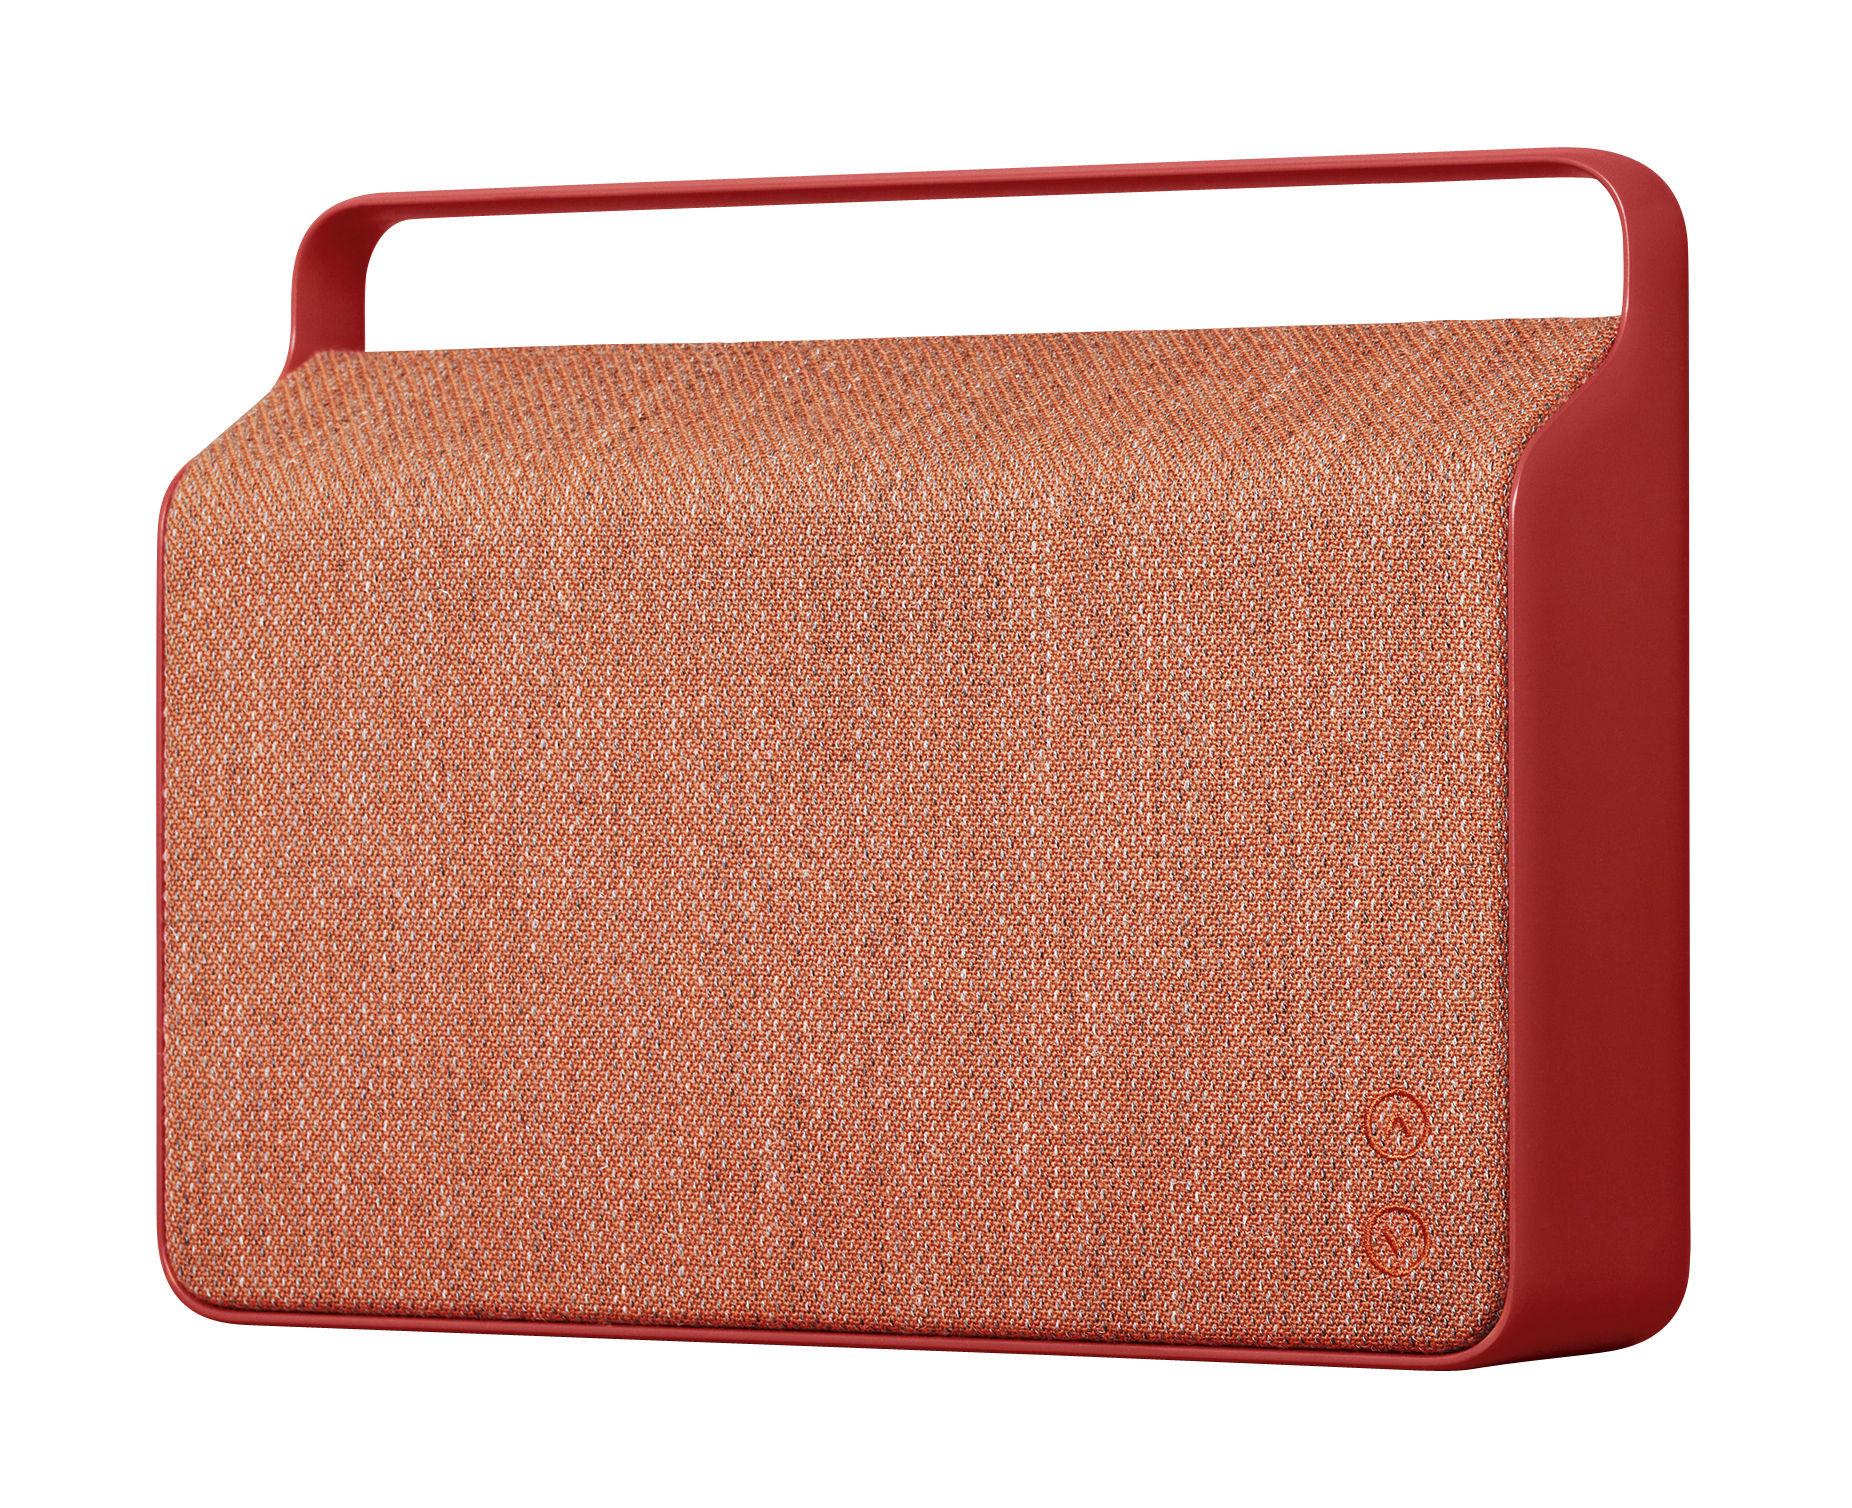 Accessoires - Enceintes audio & son - Enceinte Bluetooth Copenhague / Sans fil - Tissu & poignée alu - Vifa - Rouge - Aluminium, Tissu Kvadrat